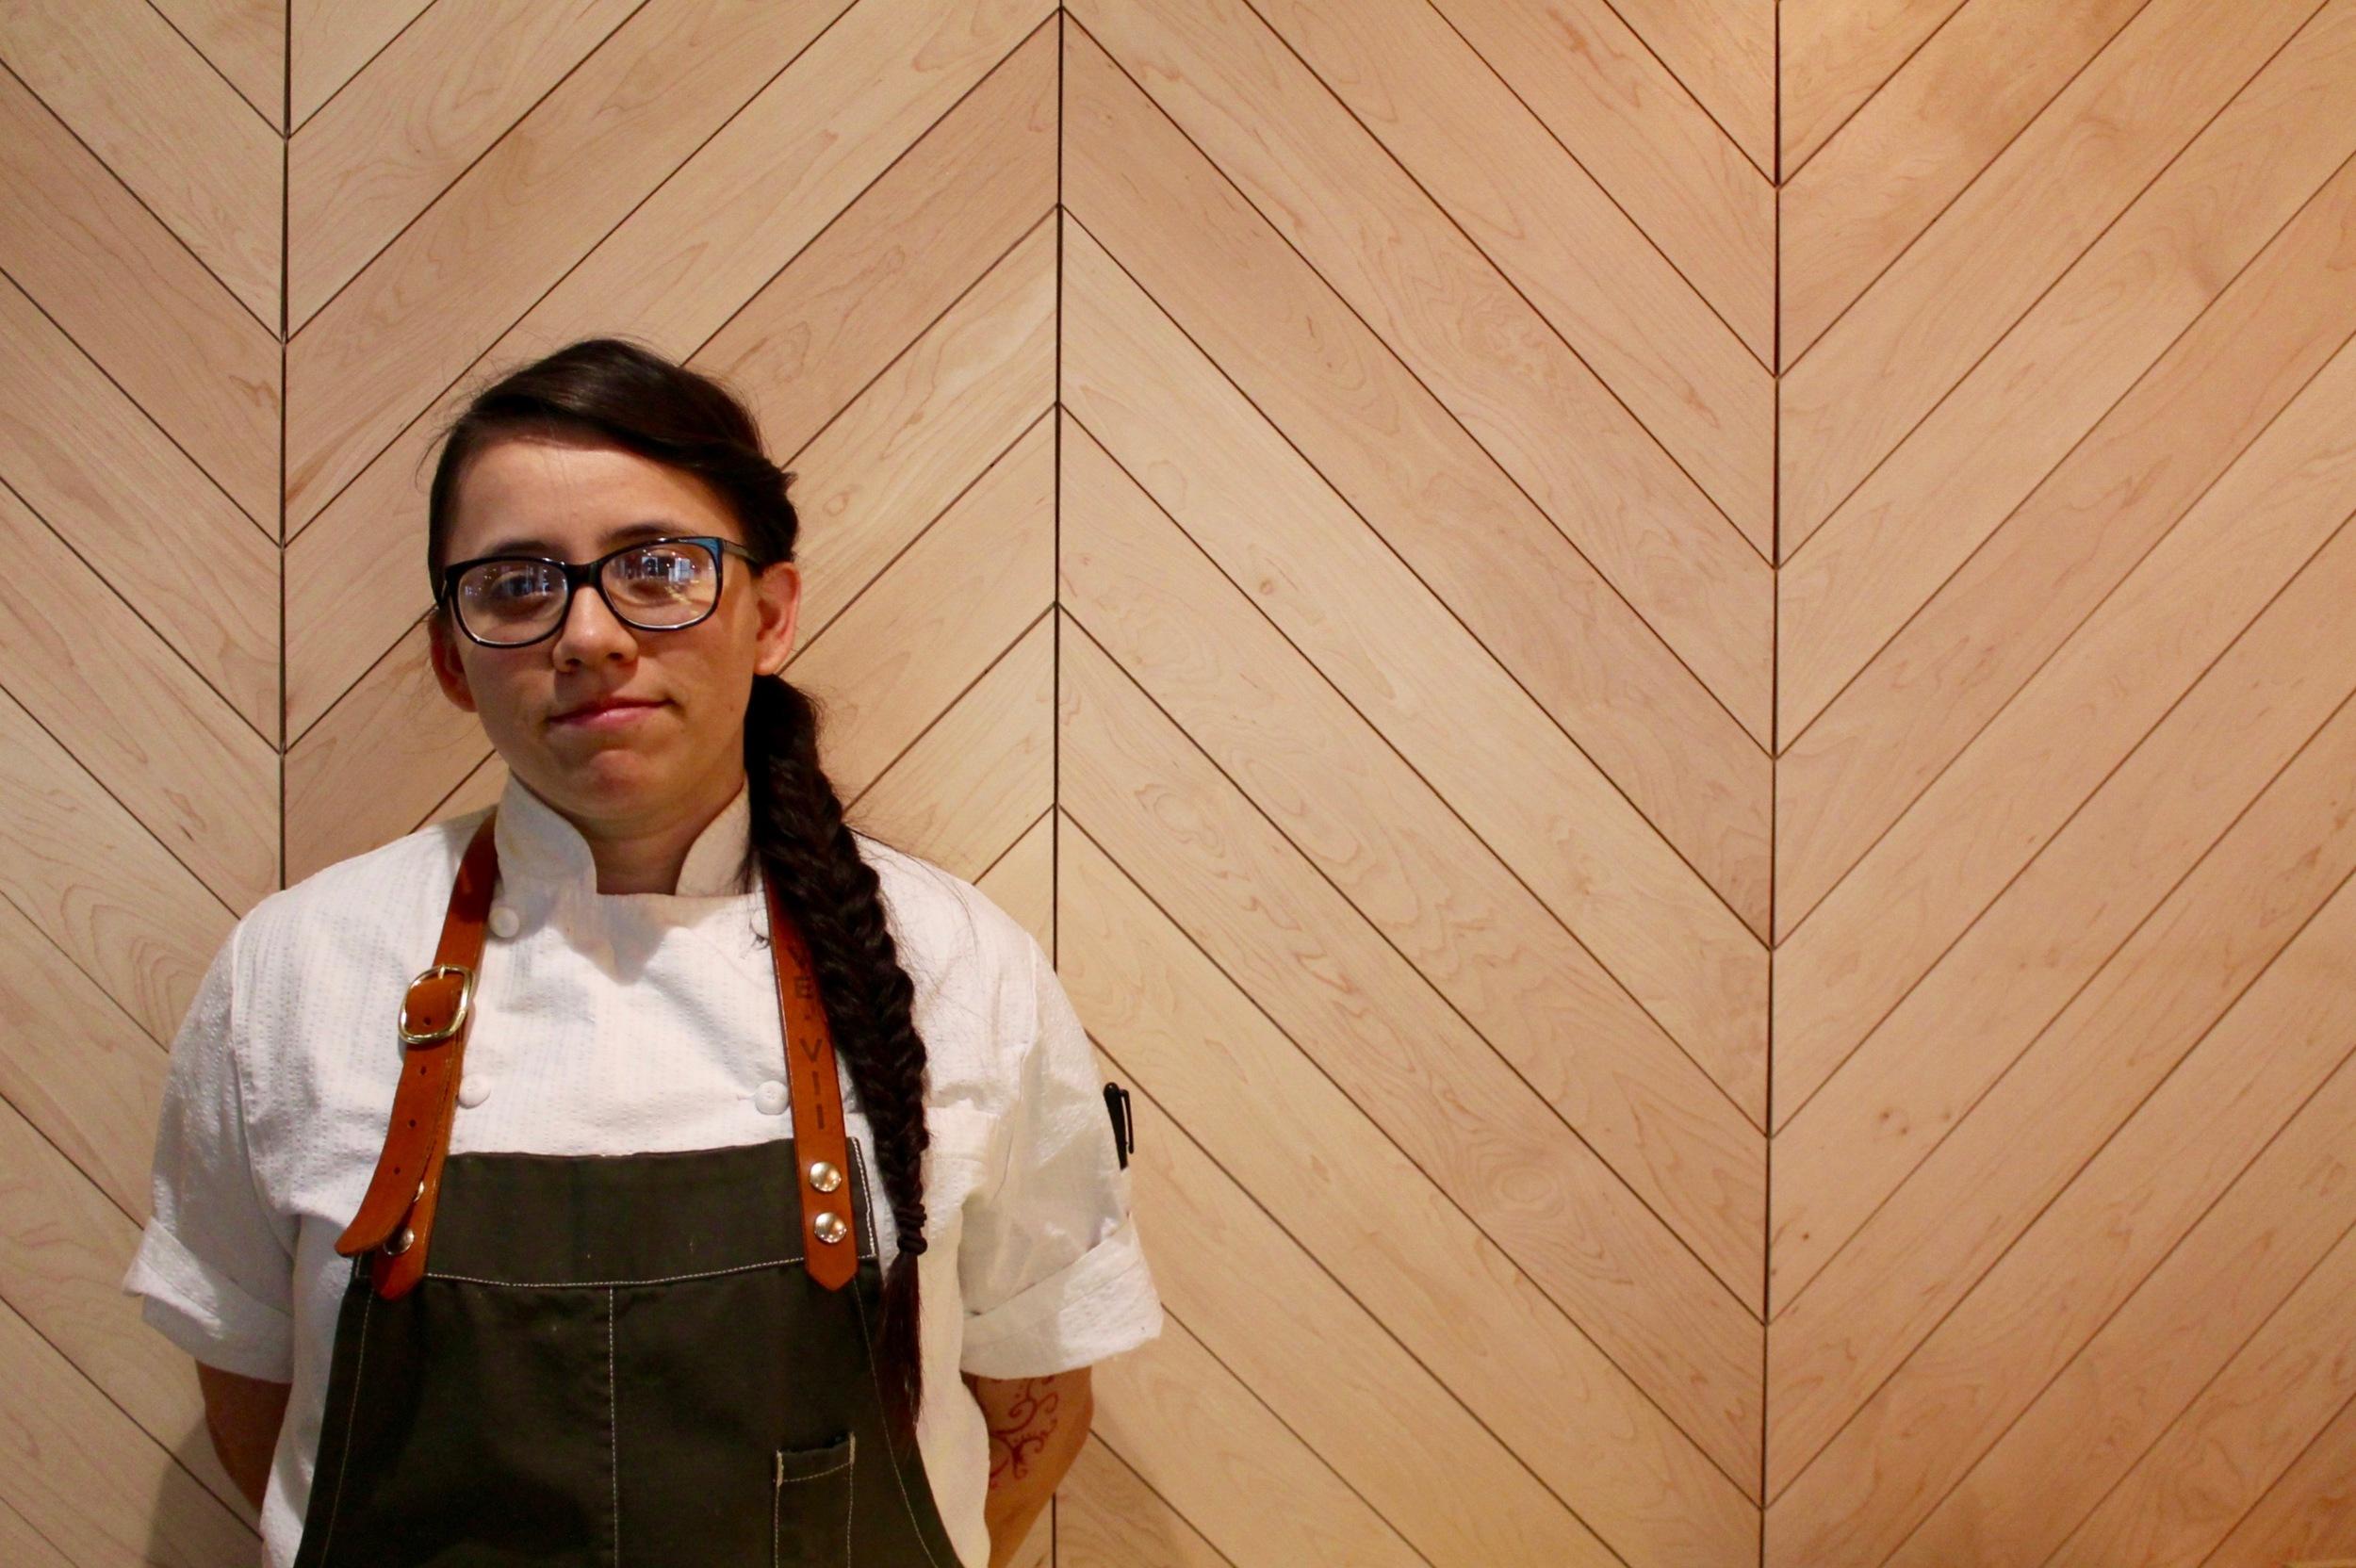 Daniela Herrera, pastry sous chef at COUNTER 3. FIVE. VII